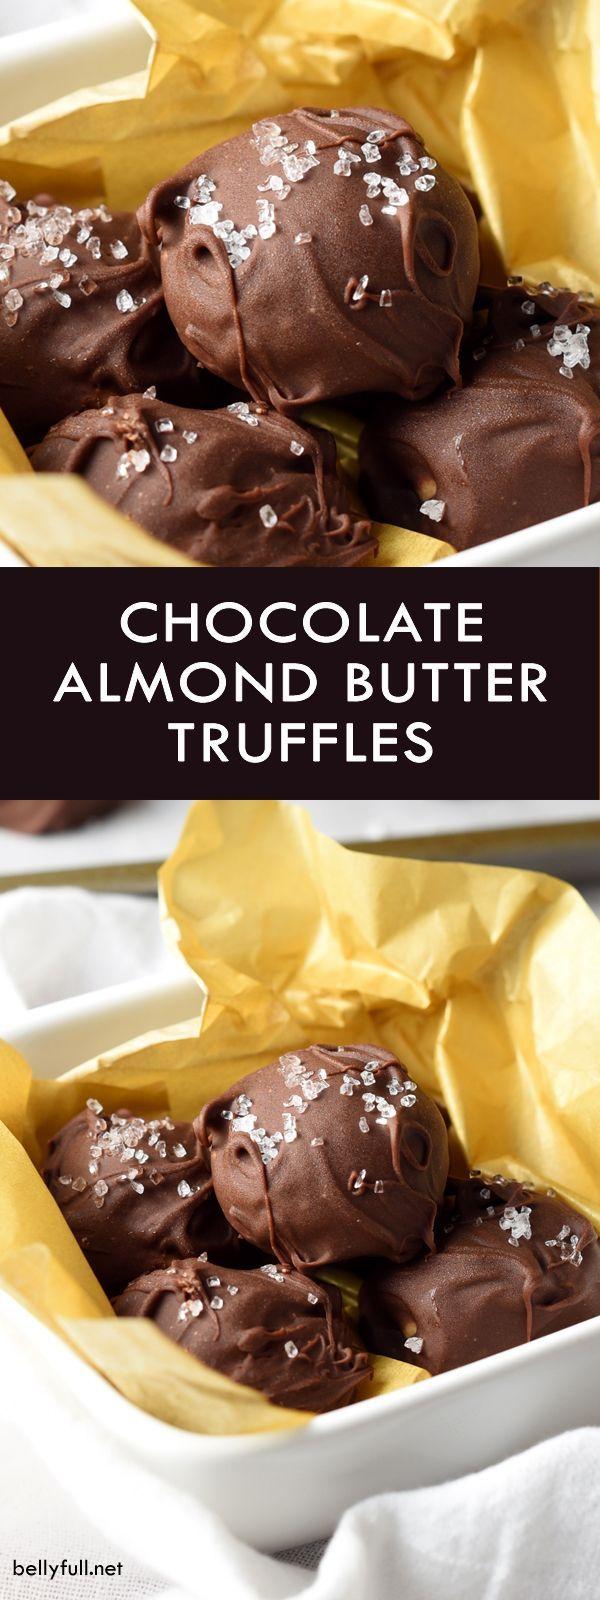 Chocolate-Almond Truffles